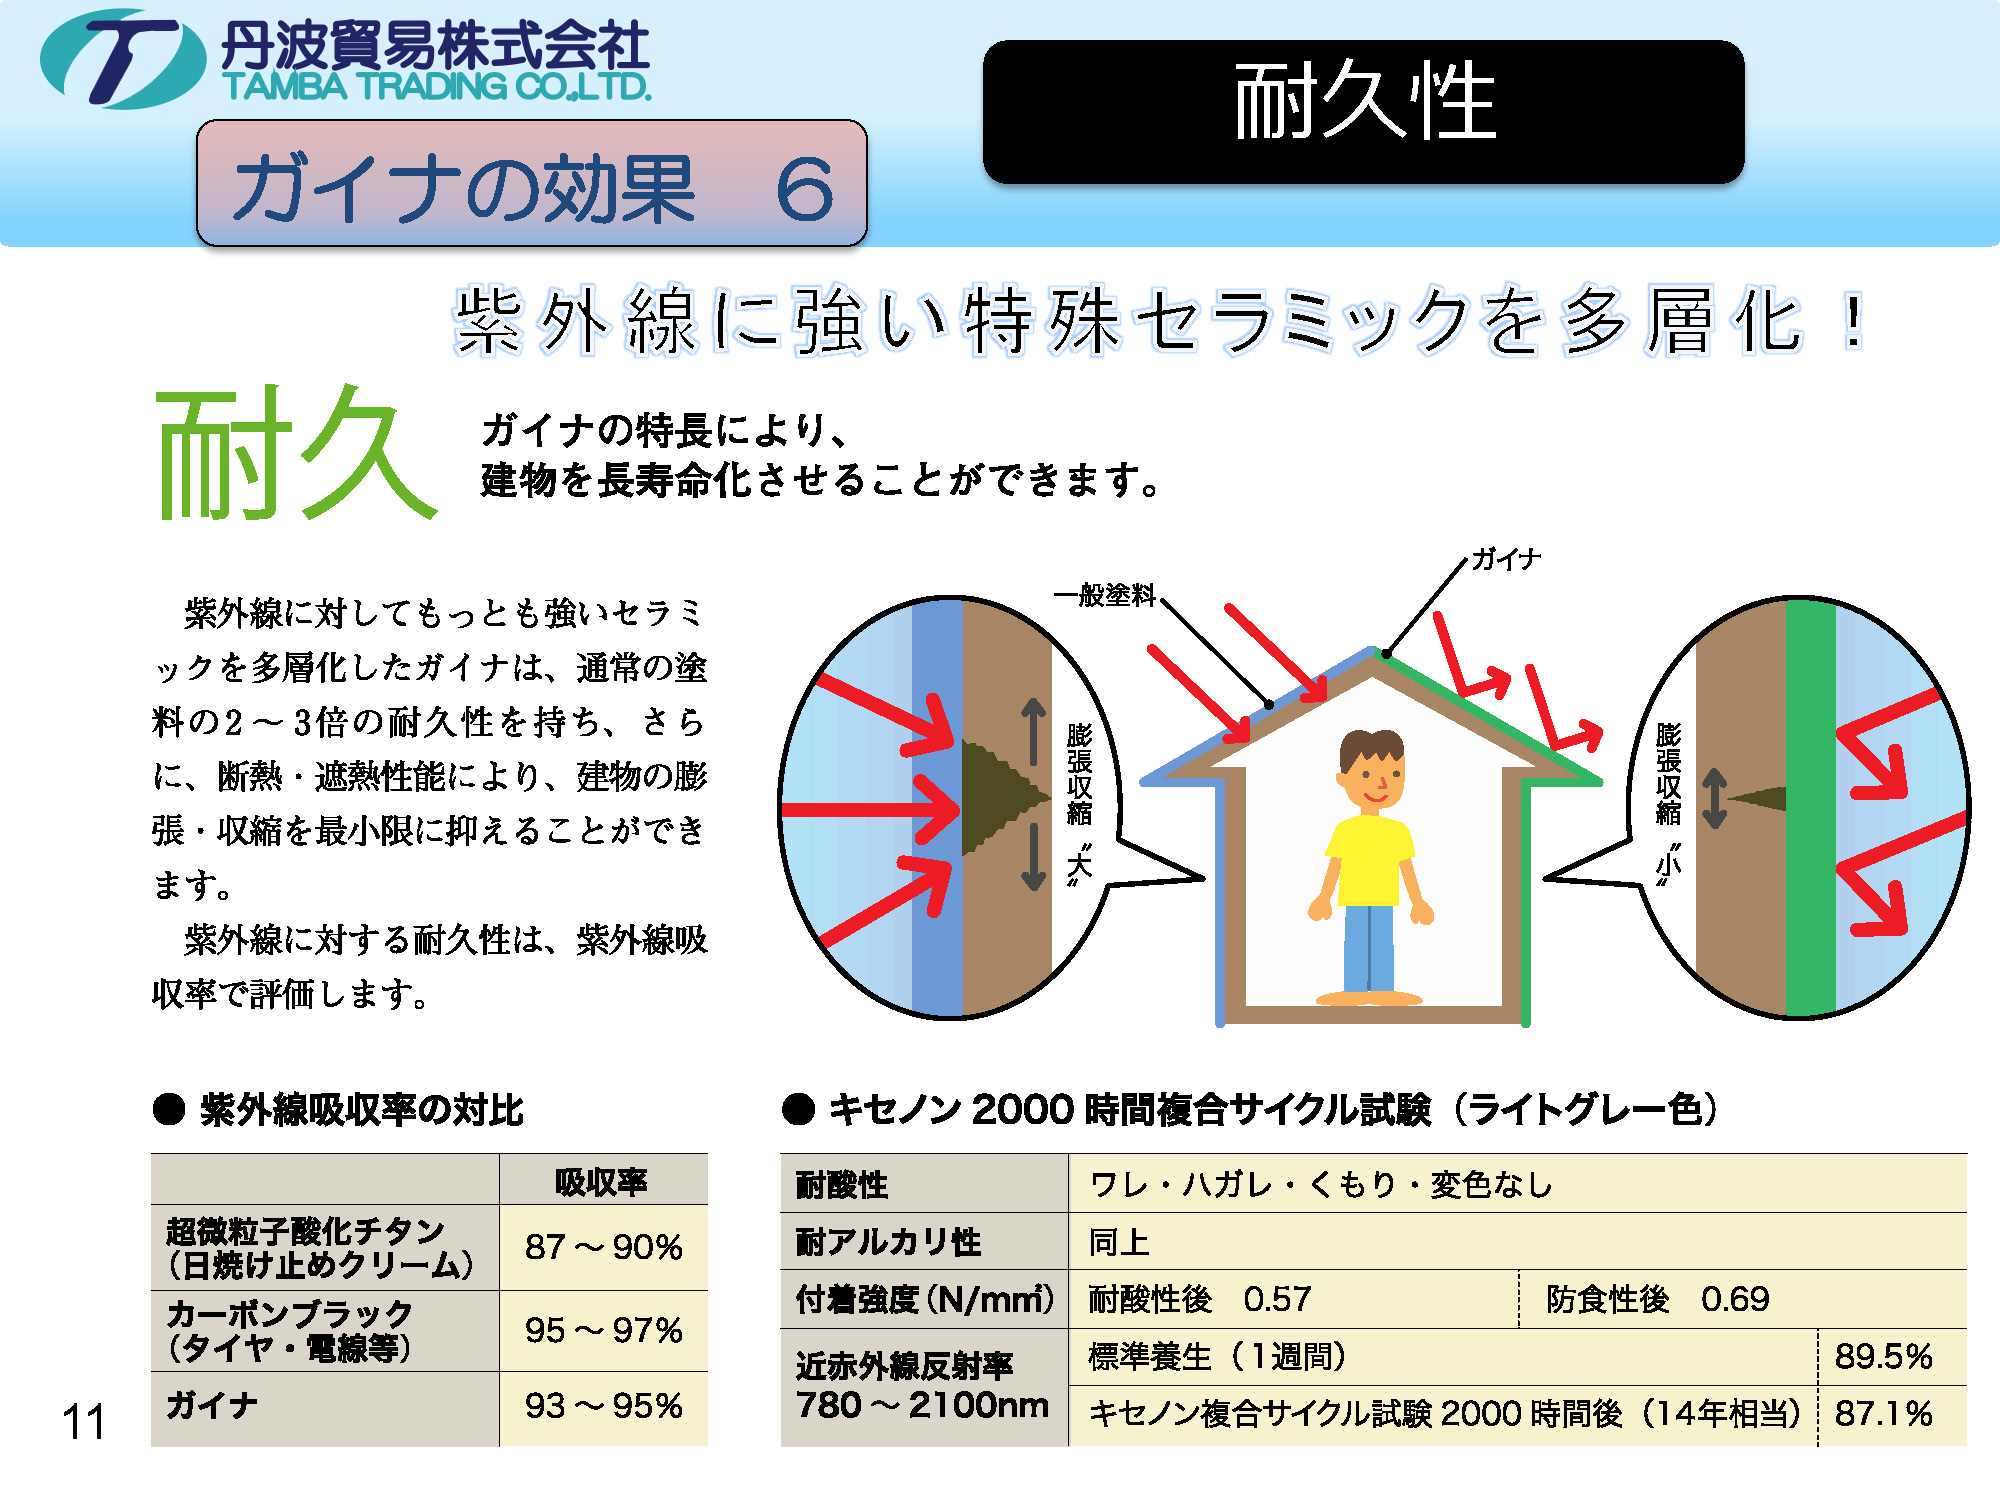 ガイナ紹介_丹波貿易_頁面_11